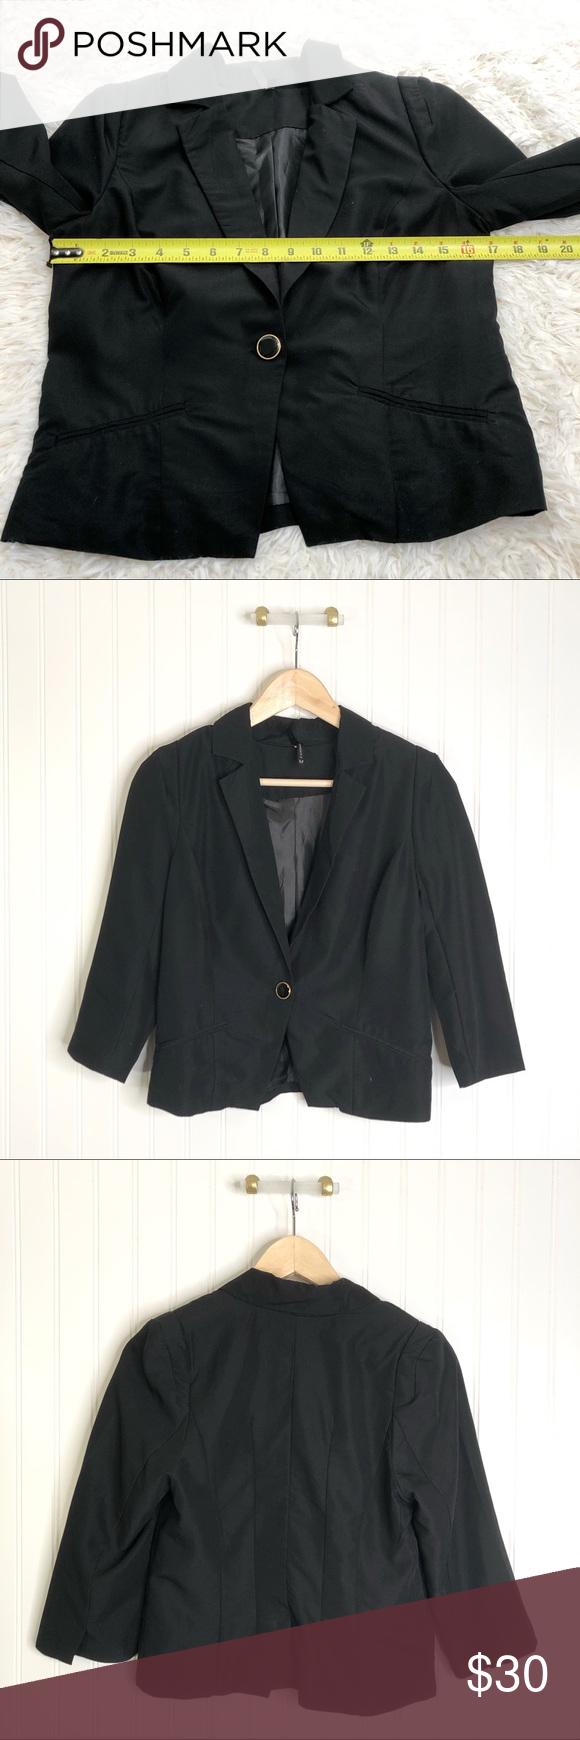 Ashley Outerwear Jacket Black Blazer Button M Outerwear Jackets Black Blazer Jackets [ 1740 x 580 Pixel ]